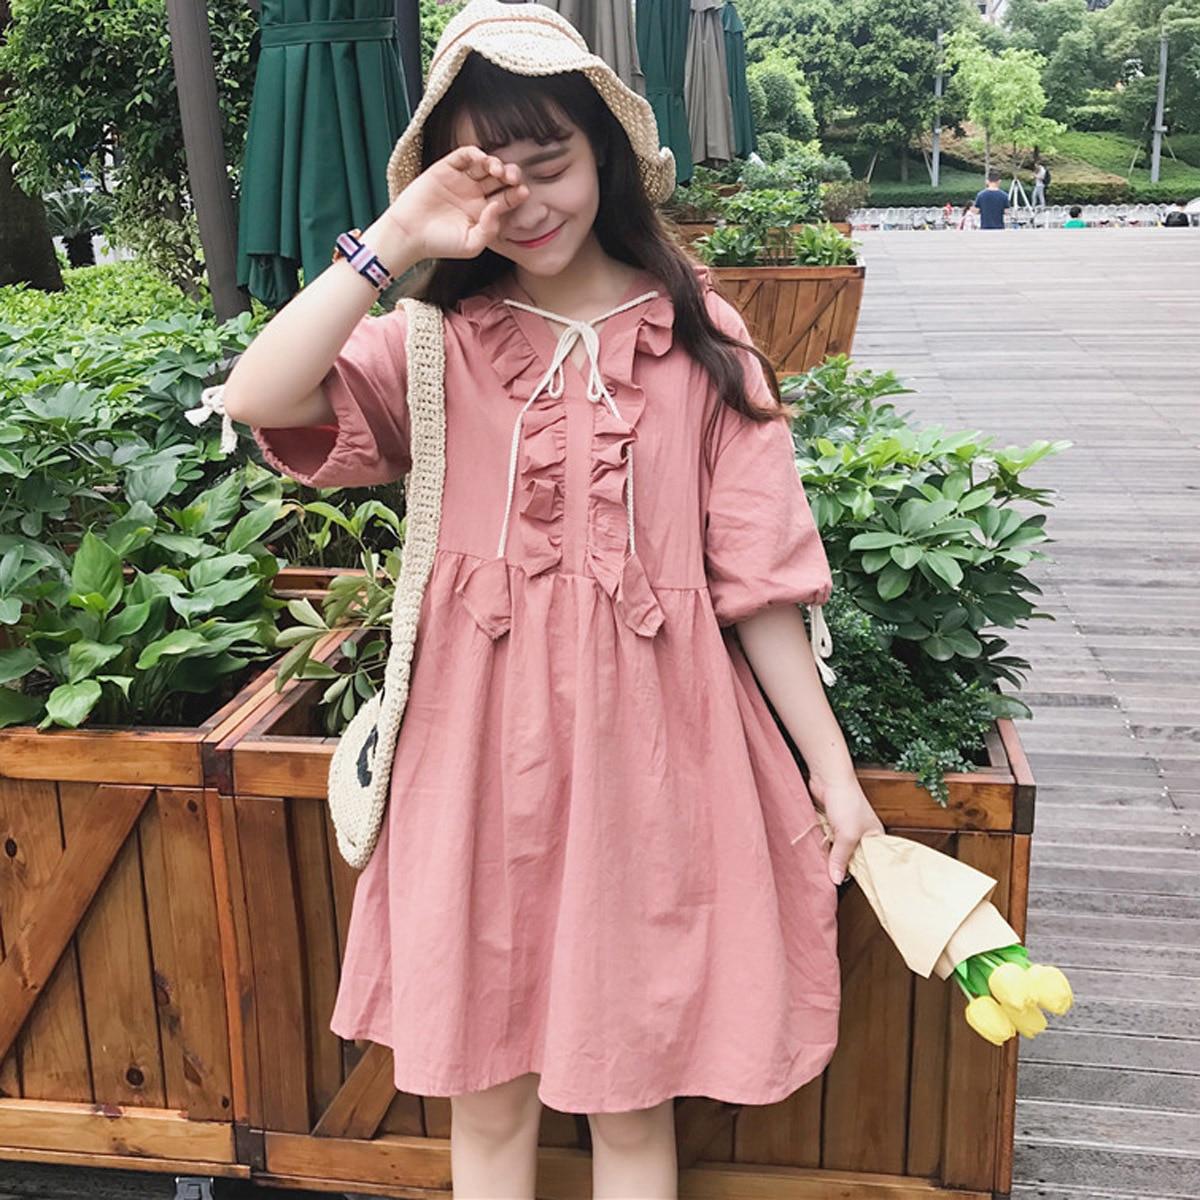 Kawaii Lolita Ruffles Baby Doll Vestido de Verano Retro Vestido Rosa ...